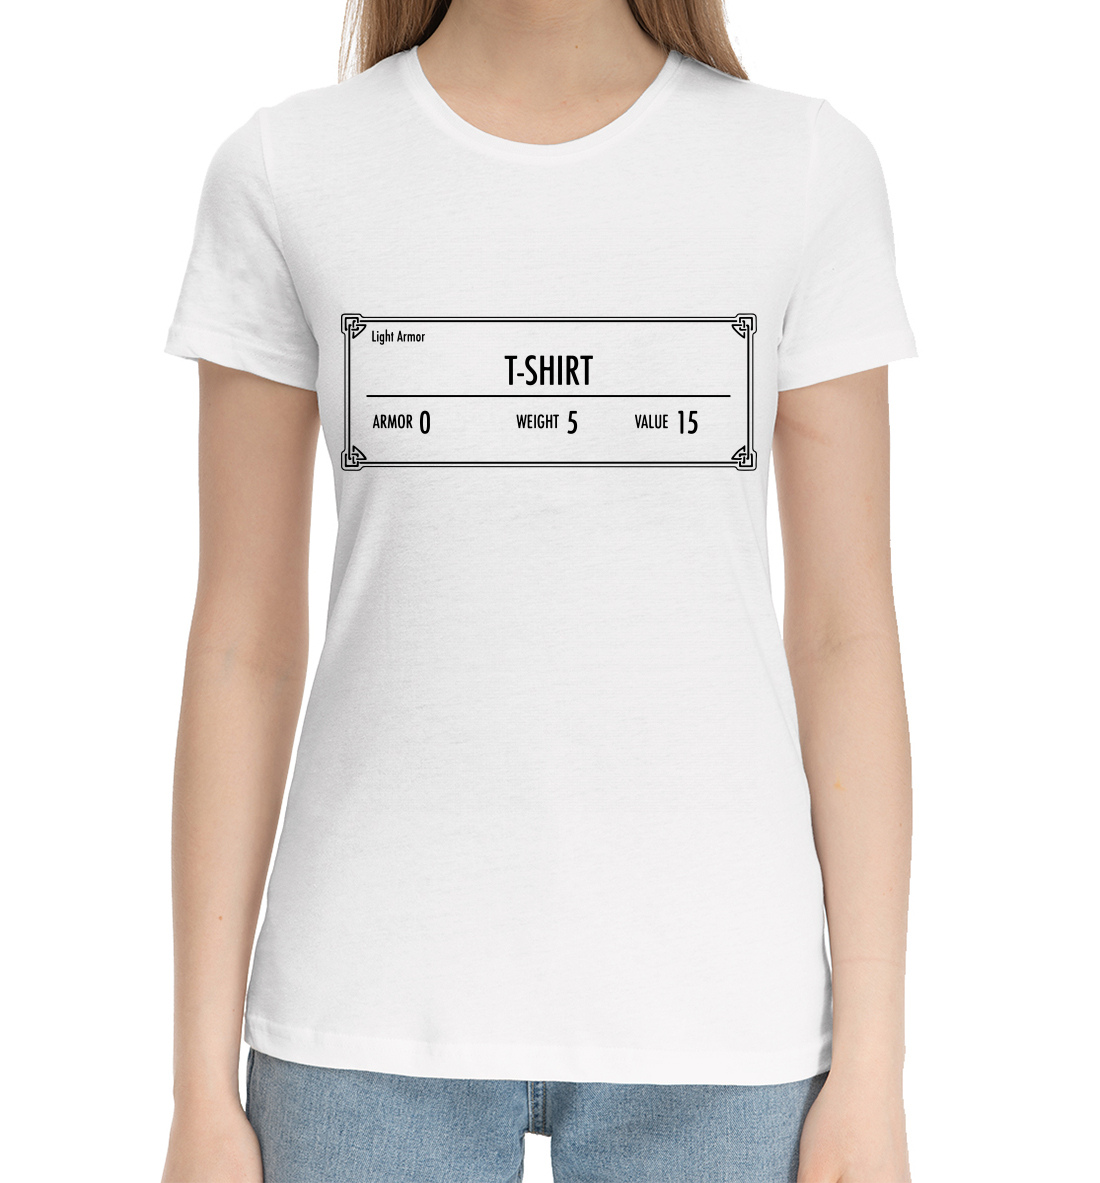 Фото - T-shirt skyrim t shirt boys котмаркот 7094а